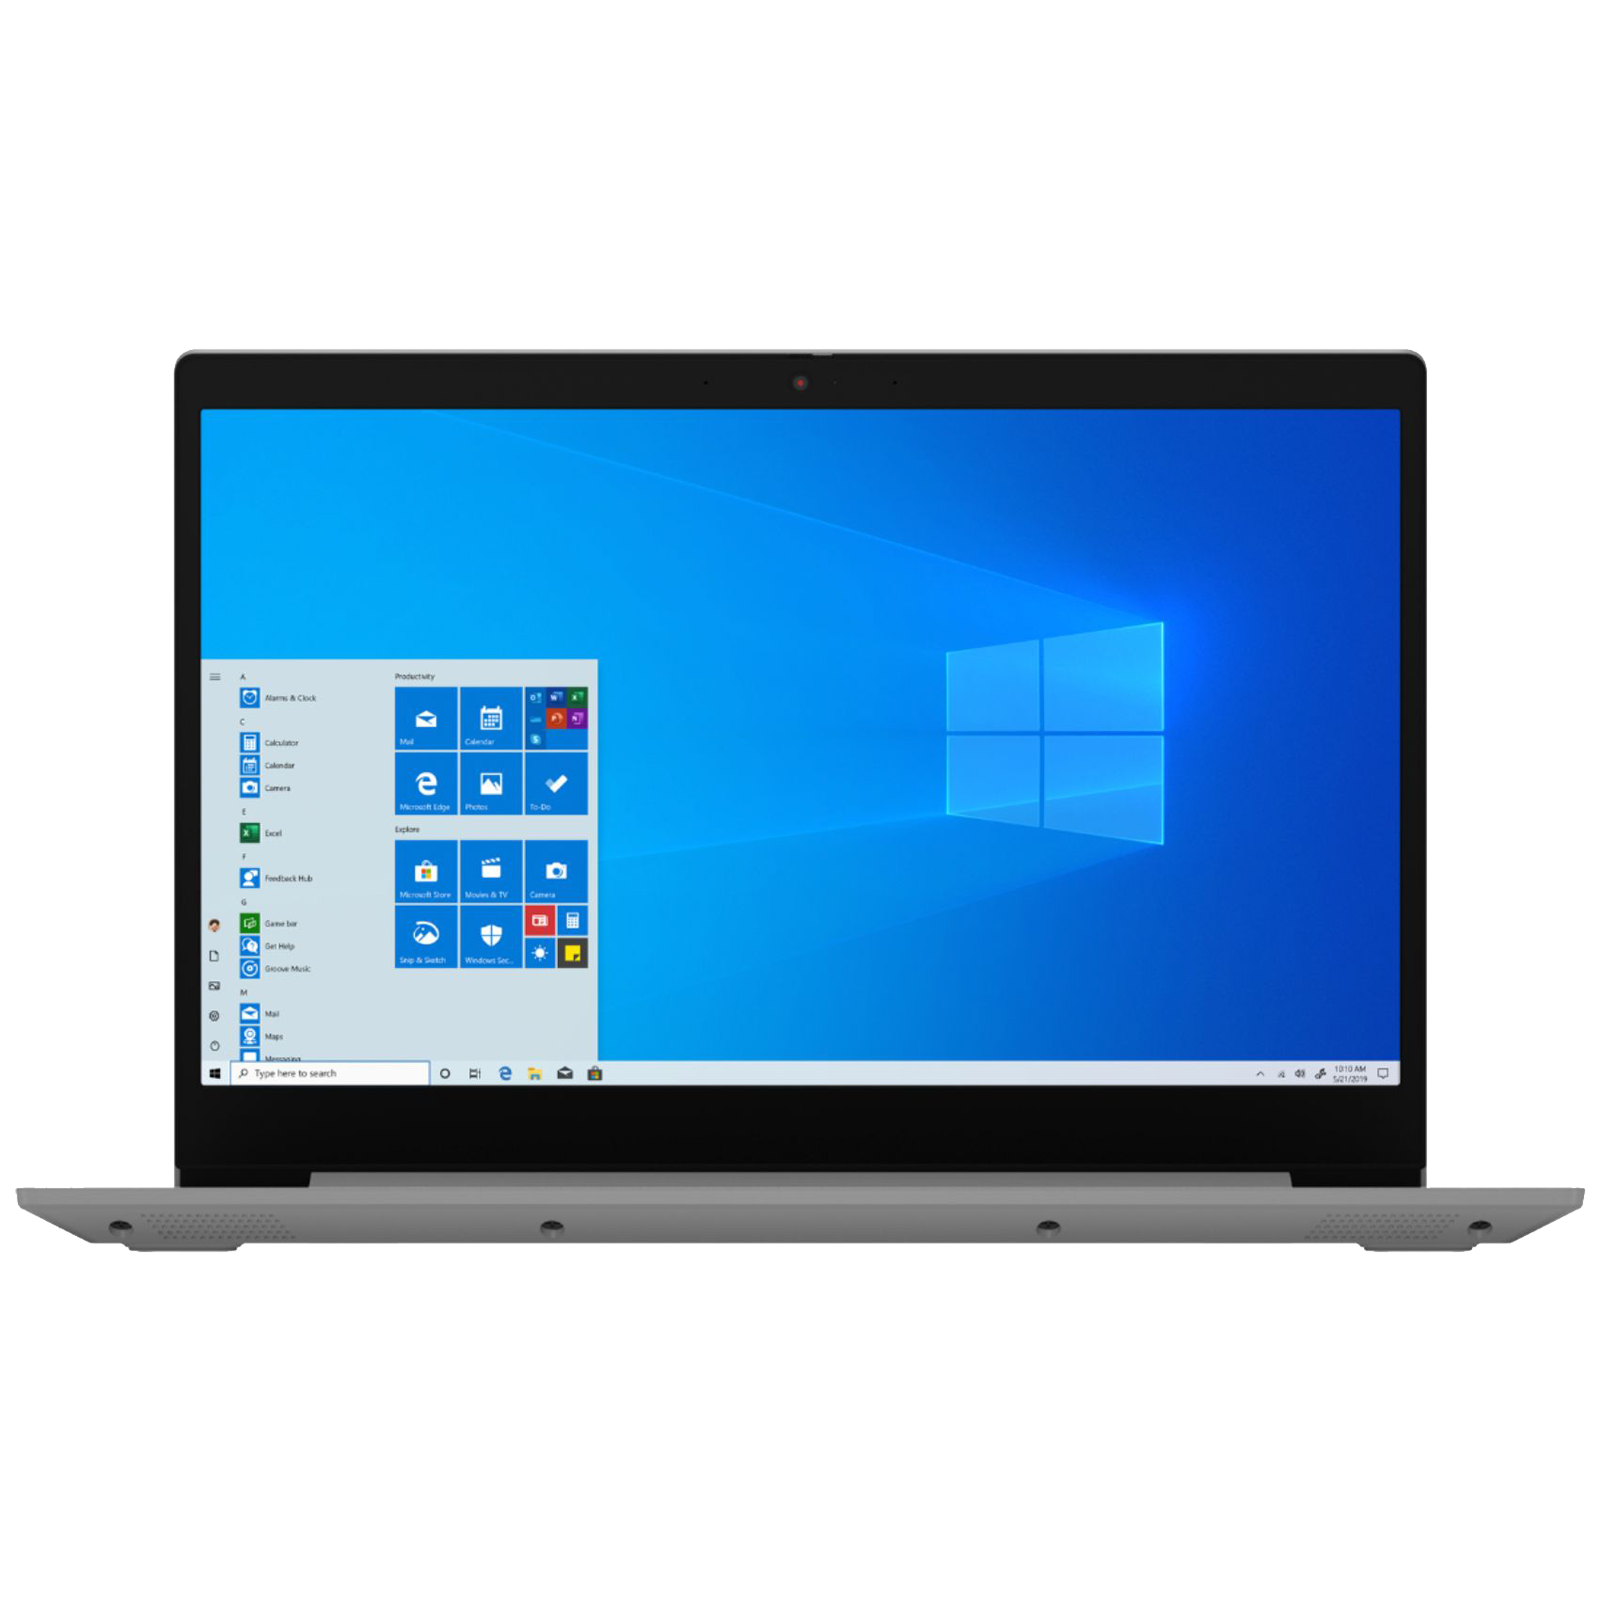 Lenovo Slim 3 (81WB0113IN) Core i3 10th Gen Windows 10 Home Thin and Light Laptop (4GB RAM, 256GB SSD, Intel UHD Graphics, MS Office, 39.62cm, Platinum Grey)_1